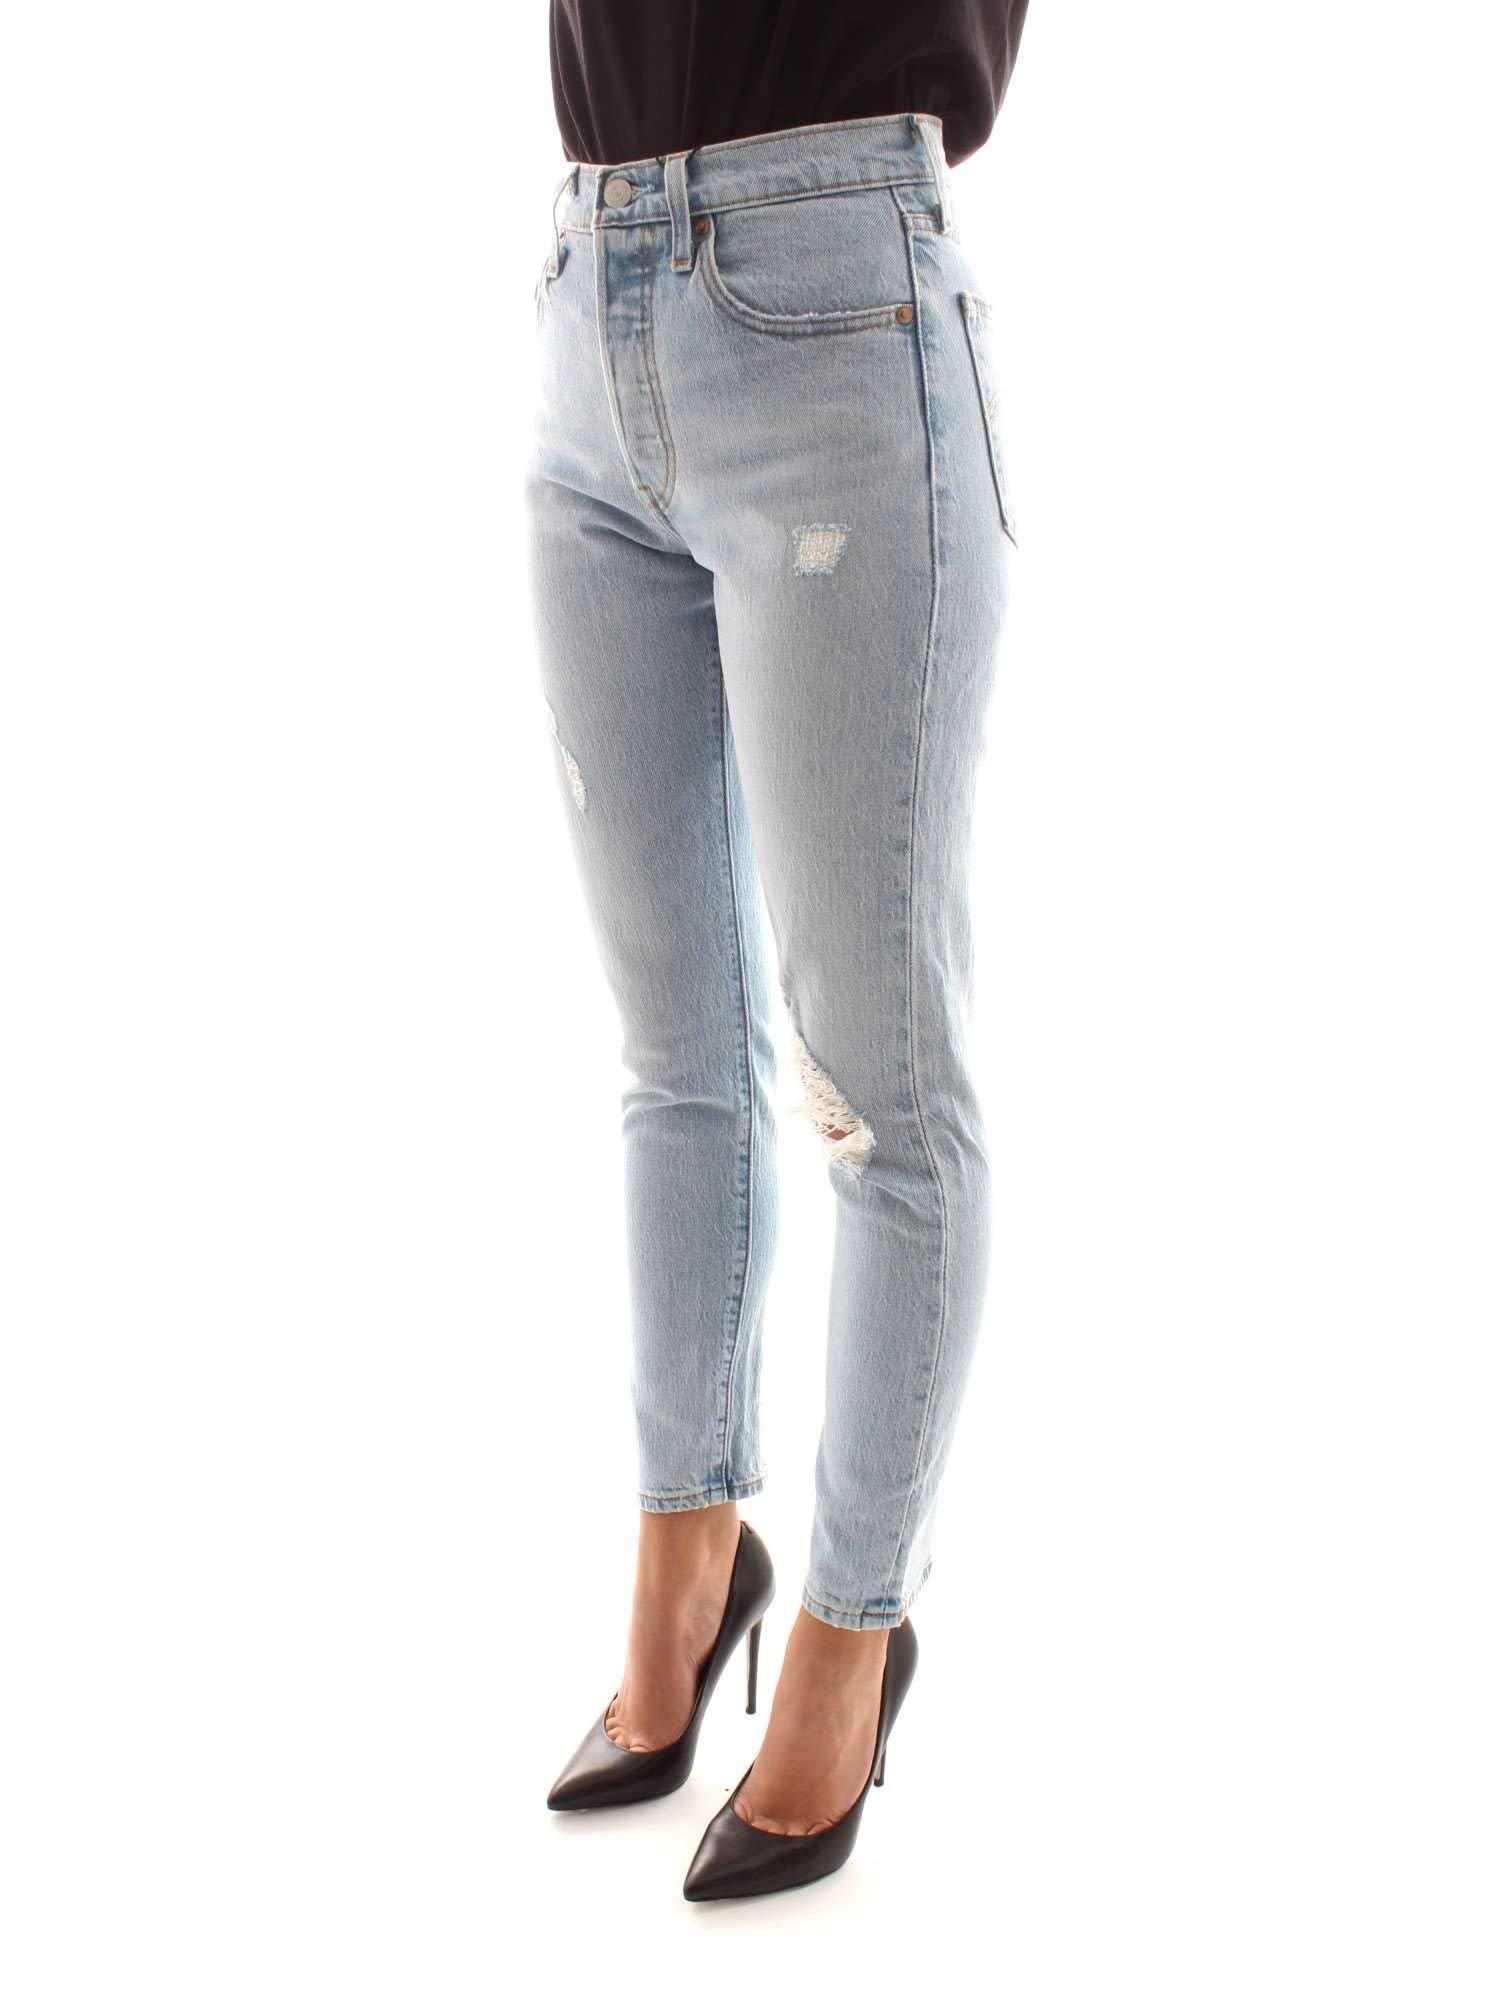 Pantalon Vaquero Levis 501 Low Pro